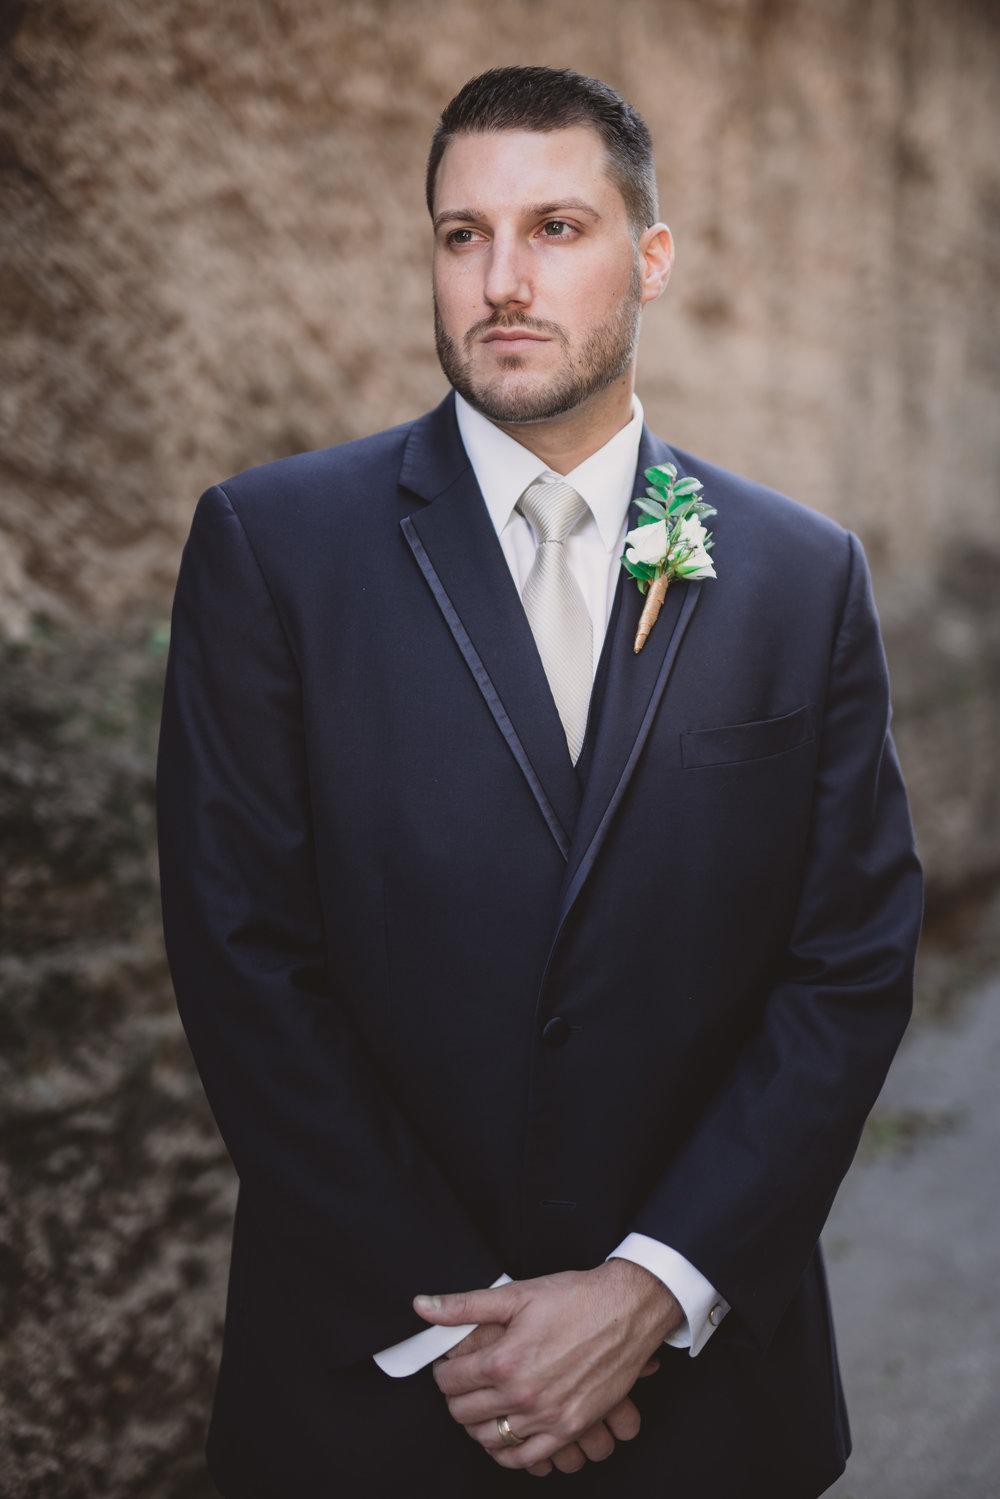 Sabrina & Anthony Wedding | Highlights-0045.jpg